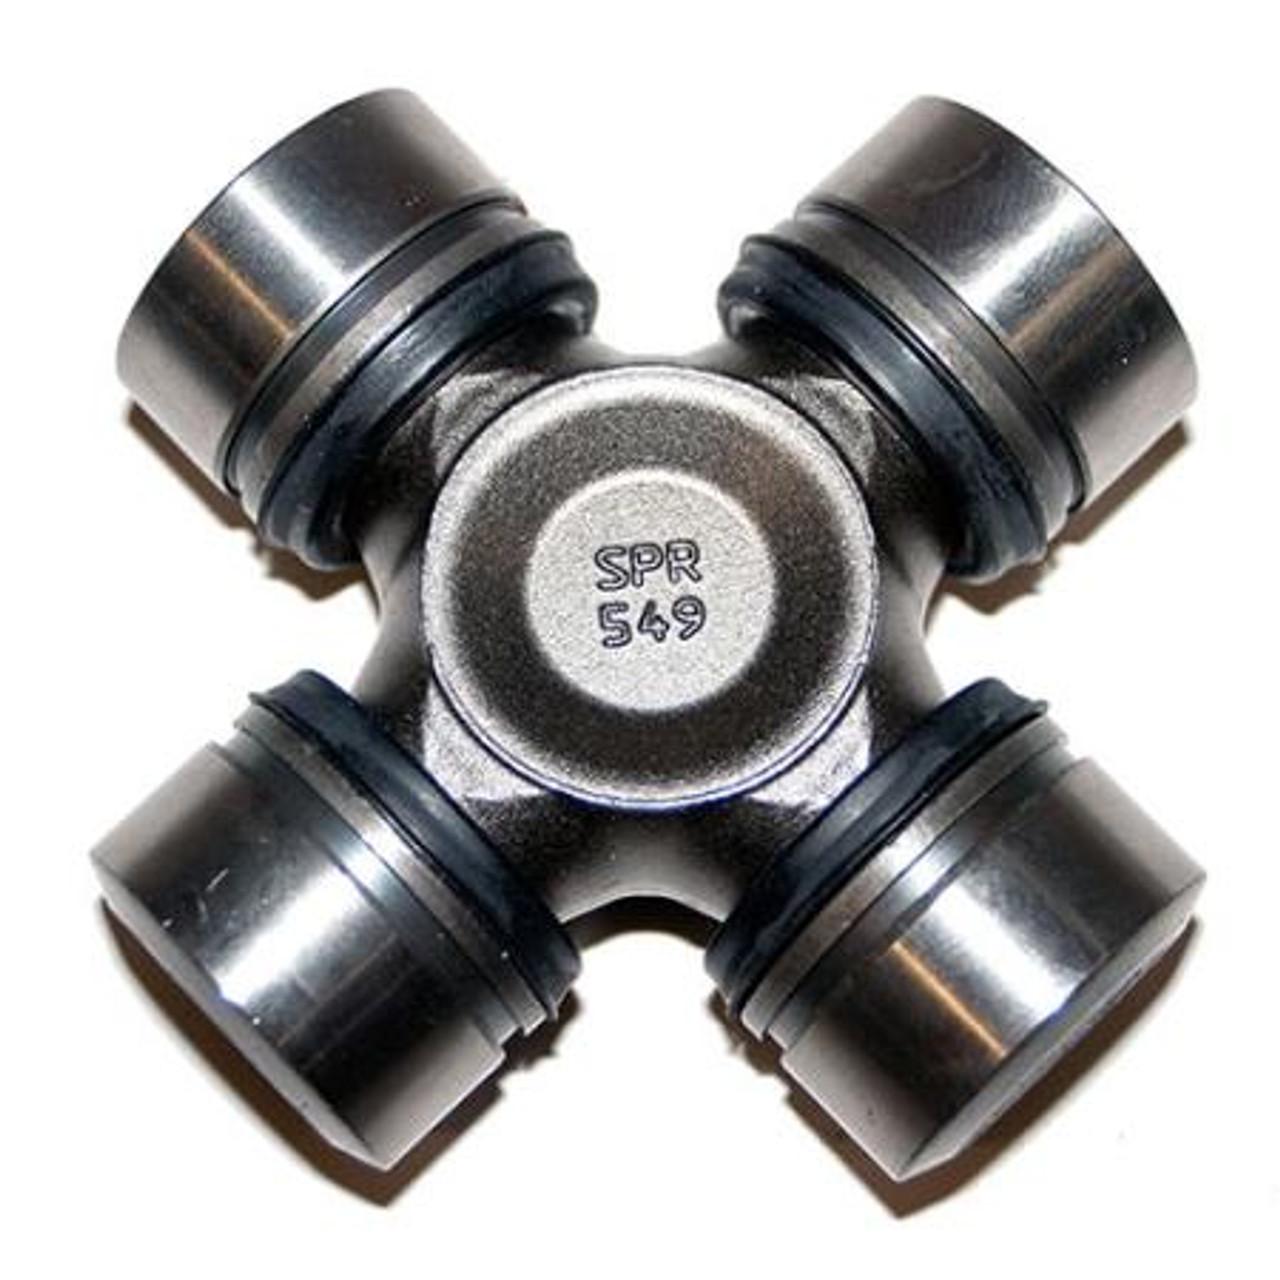 Dana Spicer DS-5-760X Heavy Duty 30/35/44 Axle U Joint for Jeep Wrangler YJ, TJ & JK